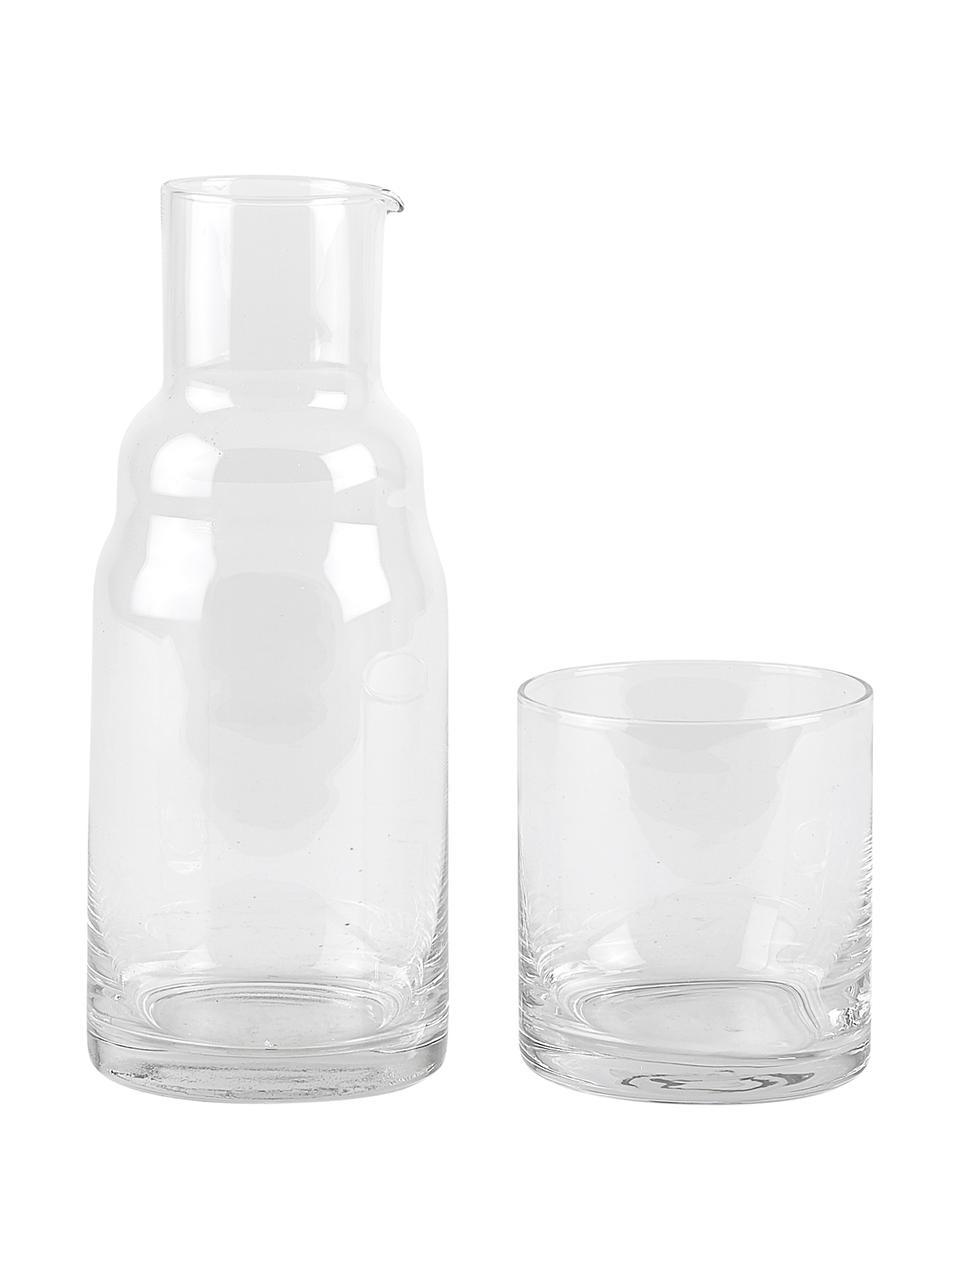 Carafe avec verreWadi, 800 ml, 2élém., Transparent